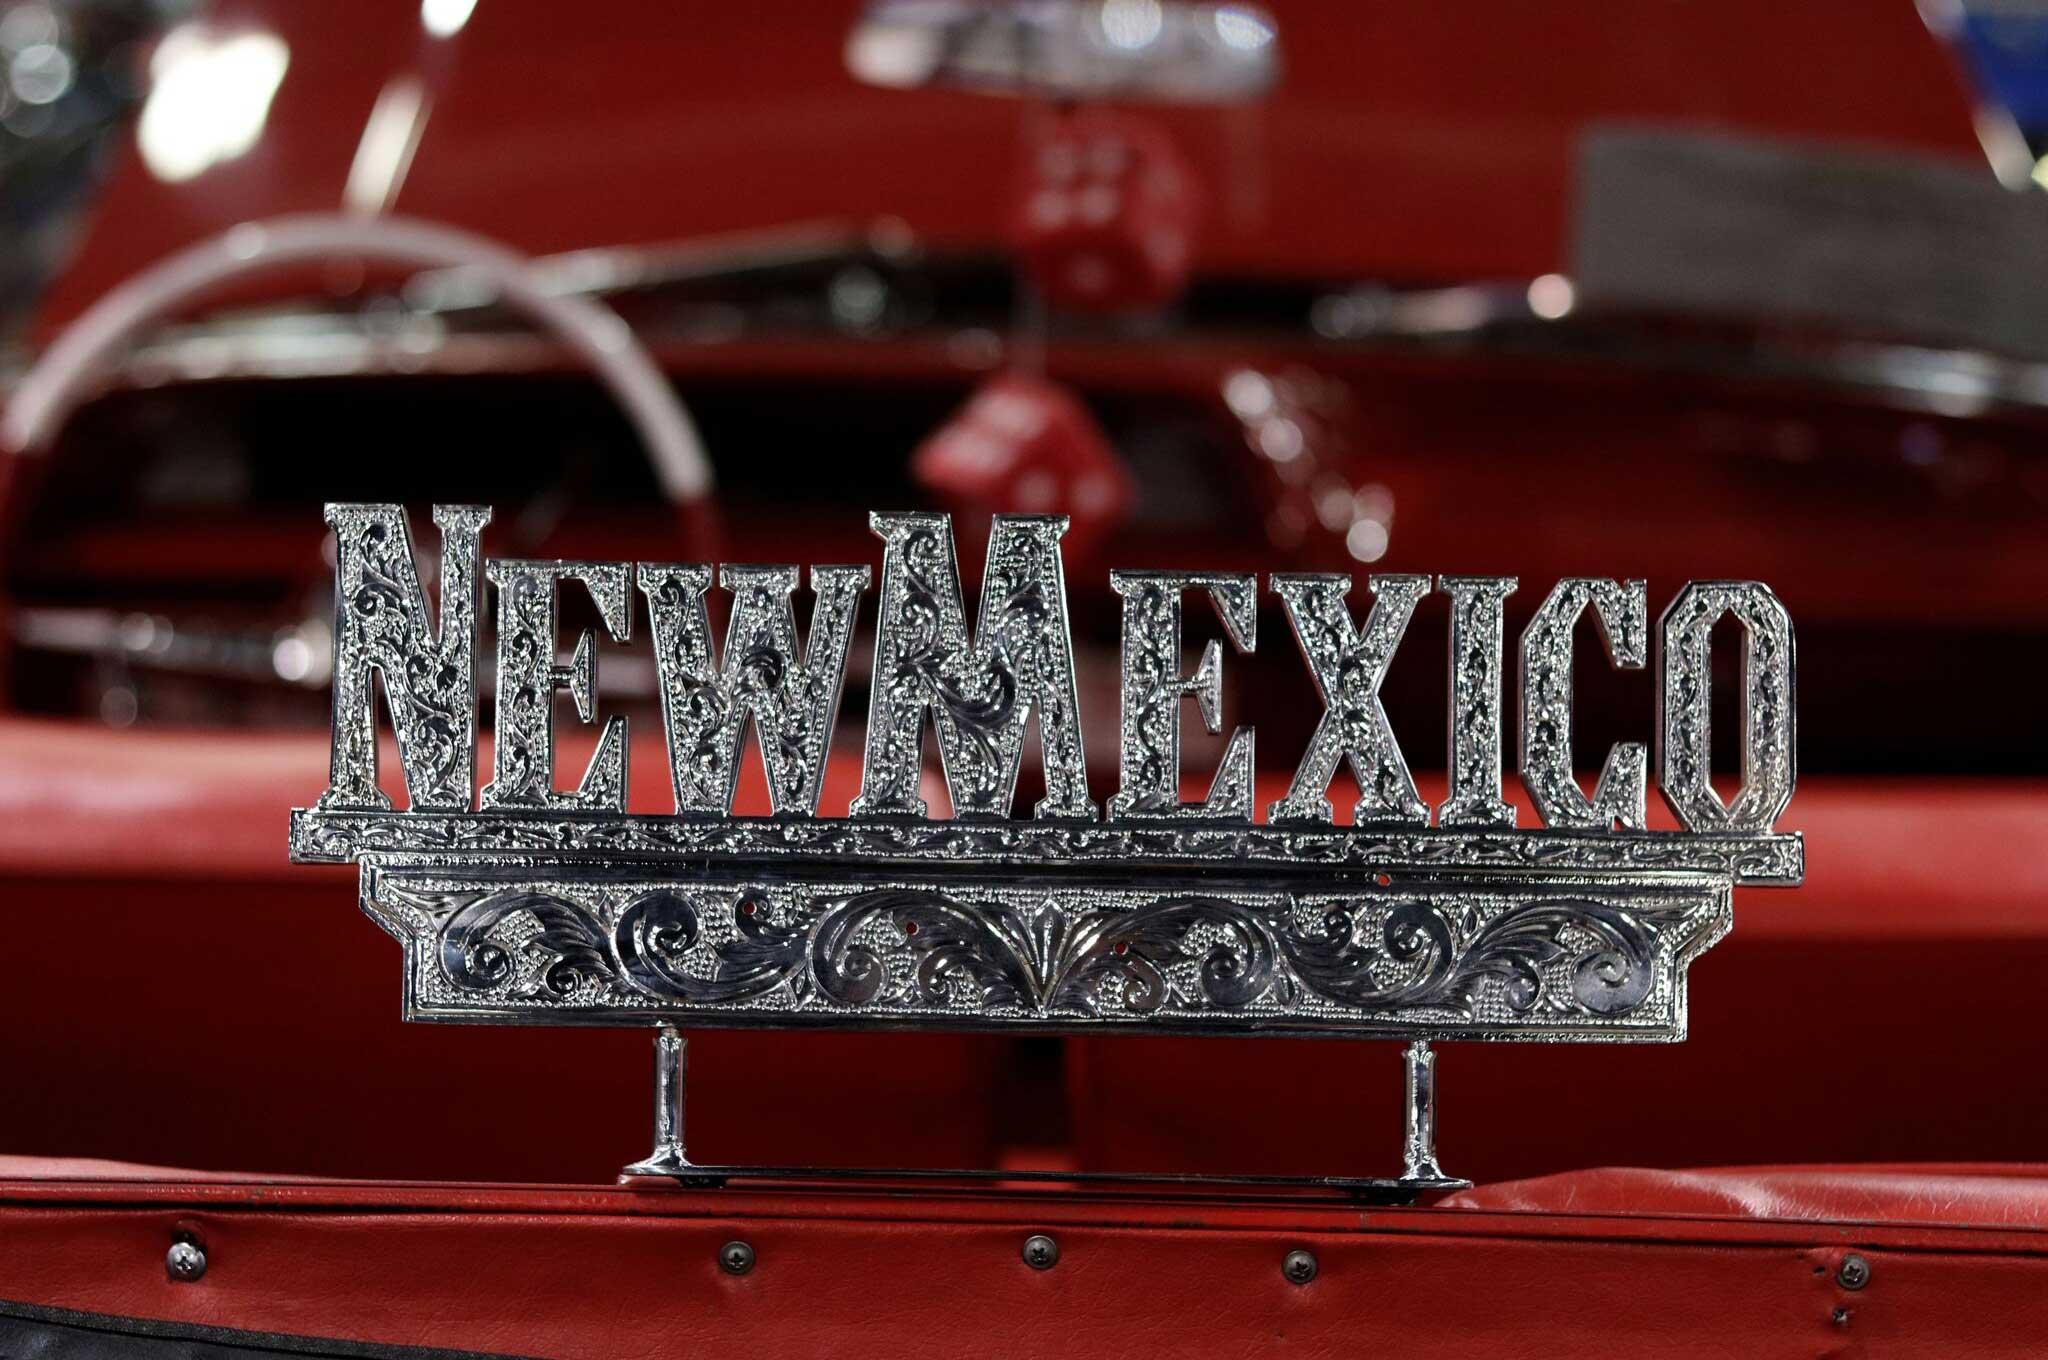 2017 lowrider albuquerque show new mexico plaque lowrider for Craft shows in albuquerque 2017